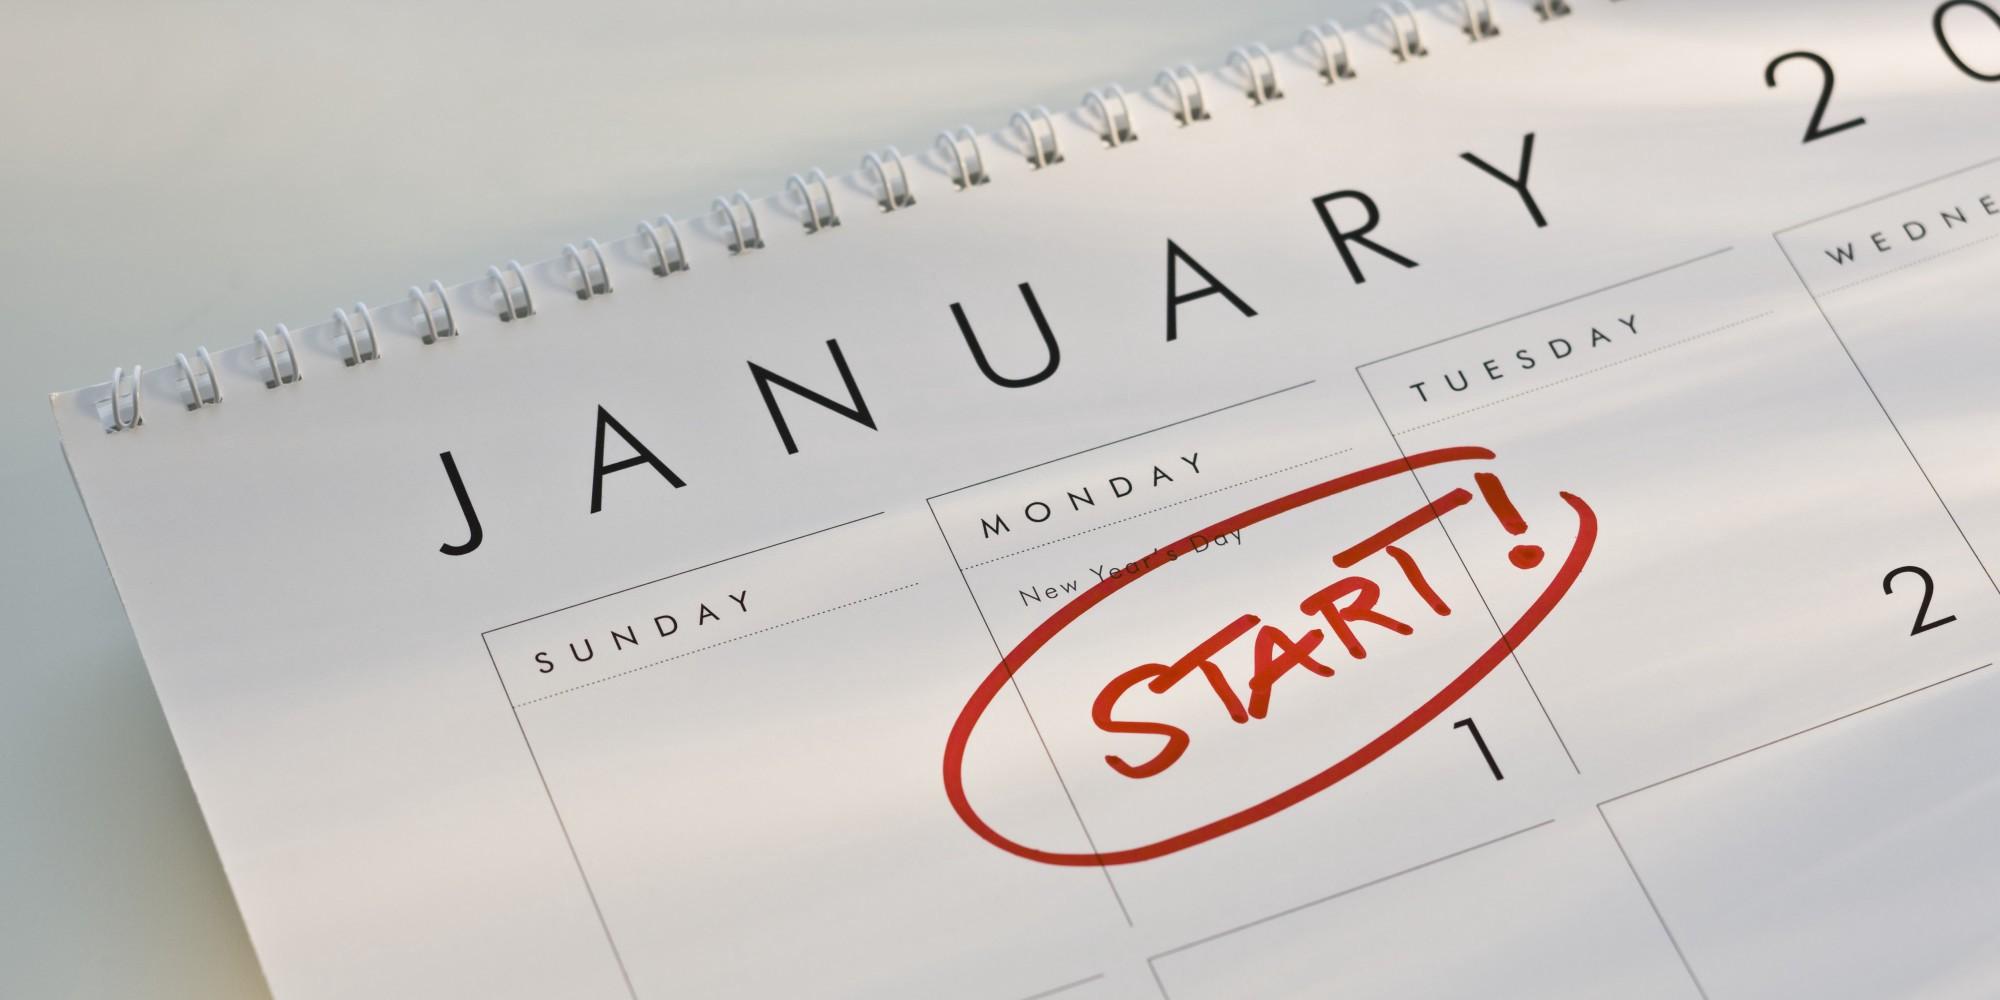 New Years Resolution.jpeg